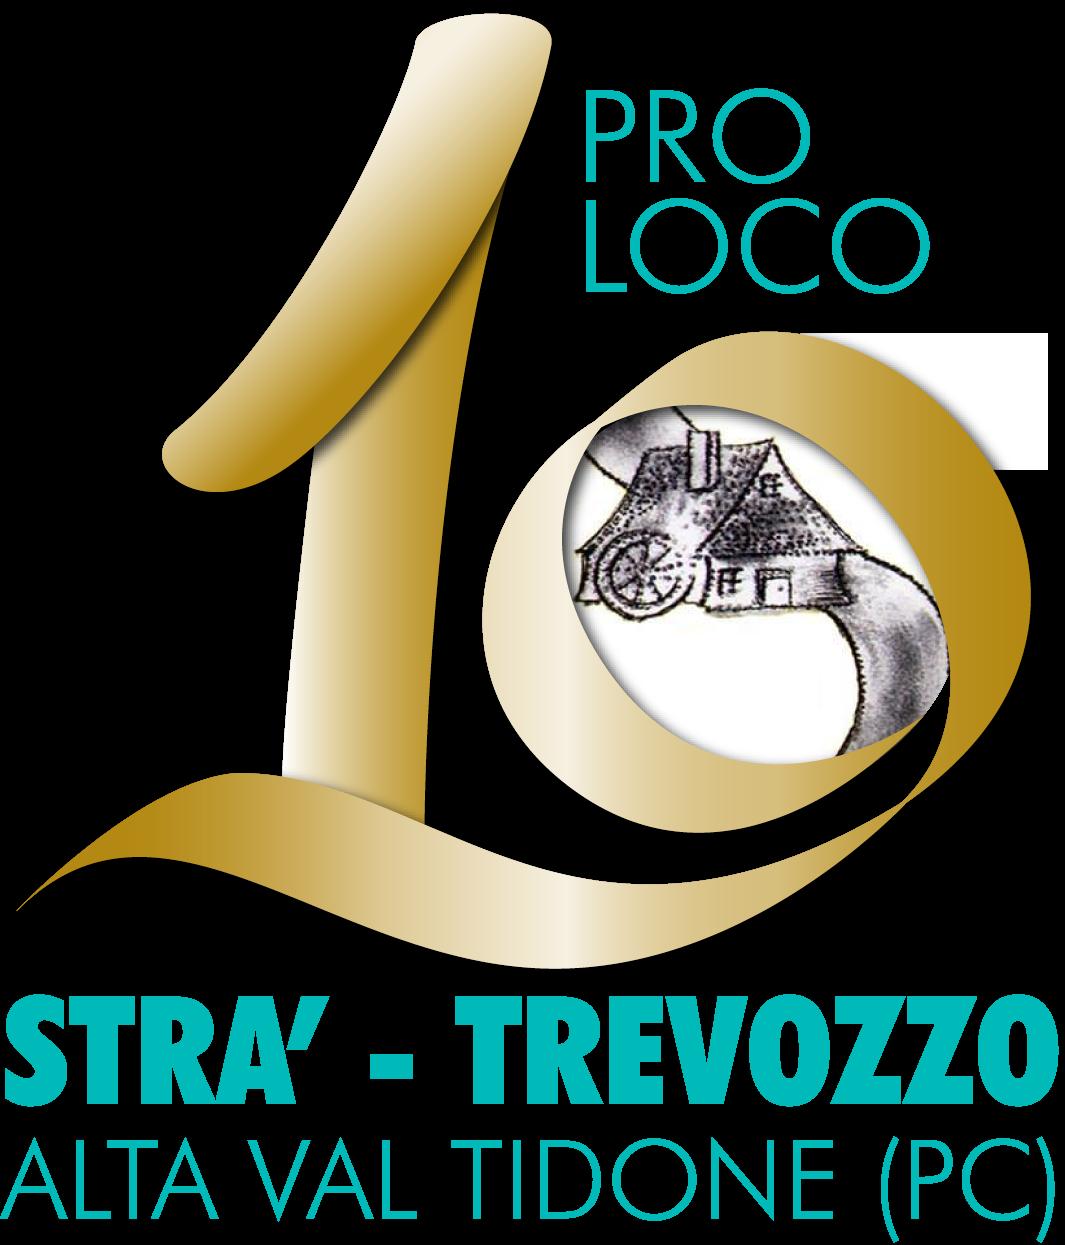 Proloco Stra-Trevozzo Logo